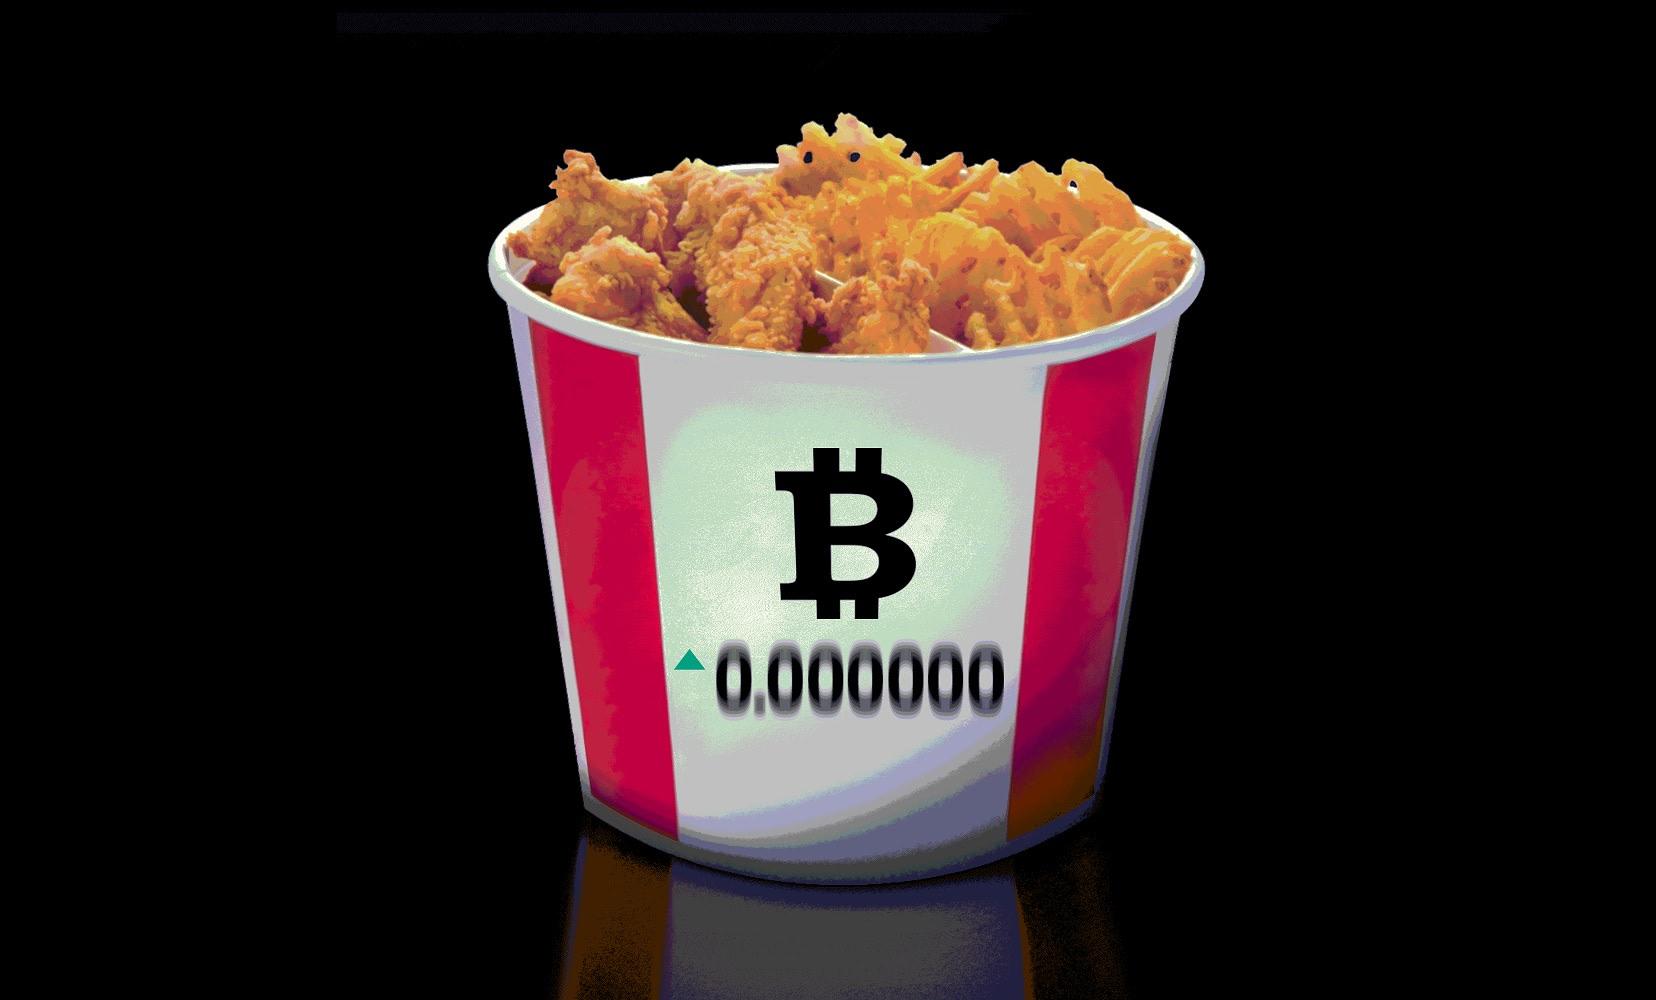 Bitcoin was briefly legal tender at kfc canada kfc canada stopboris Choice Image